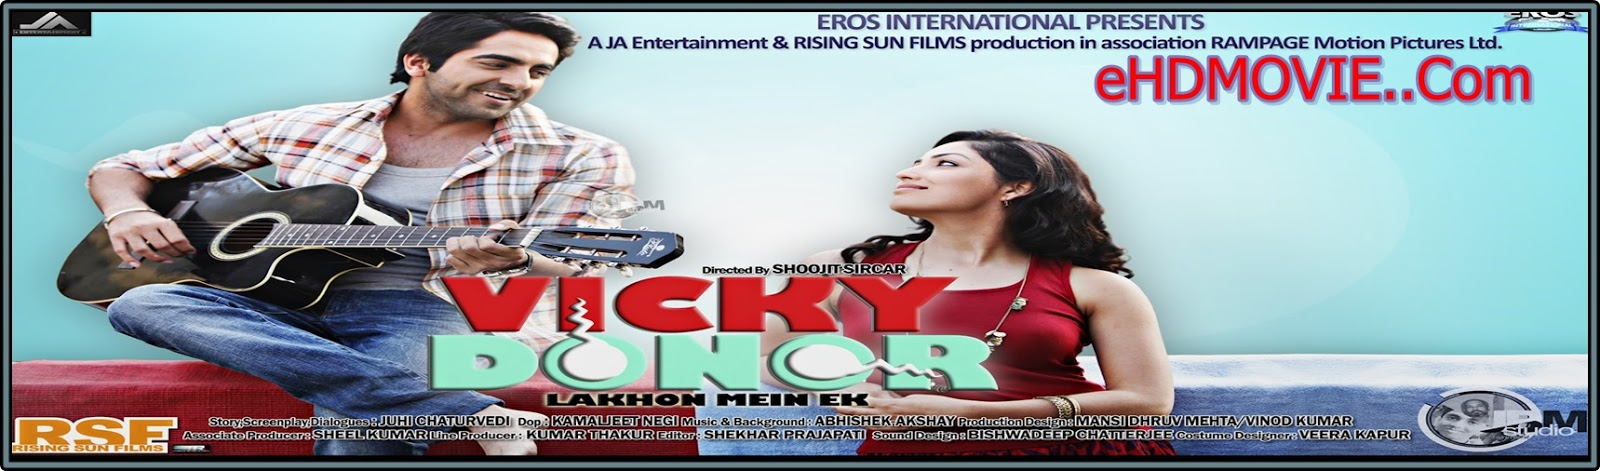 Vicky Donor 2012 Full Movie Hindi 720p - HEVC - 480p ORG BRRip 350MB - 600MB - 1GB ESubs Free Download